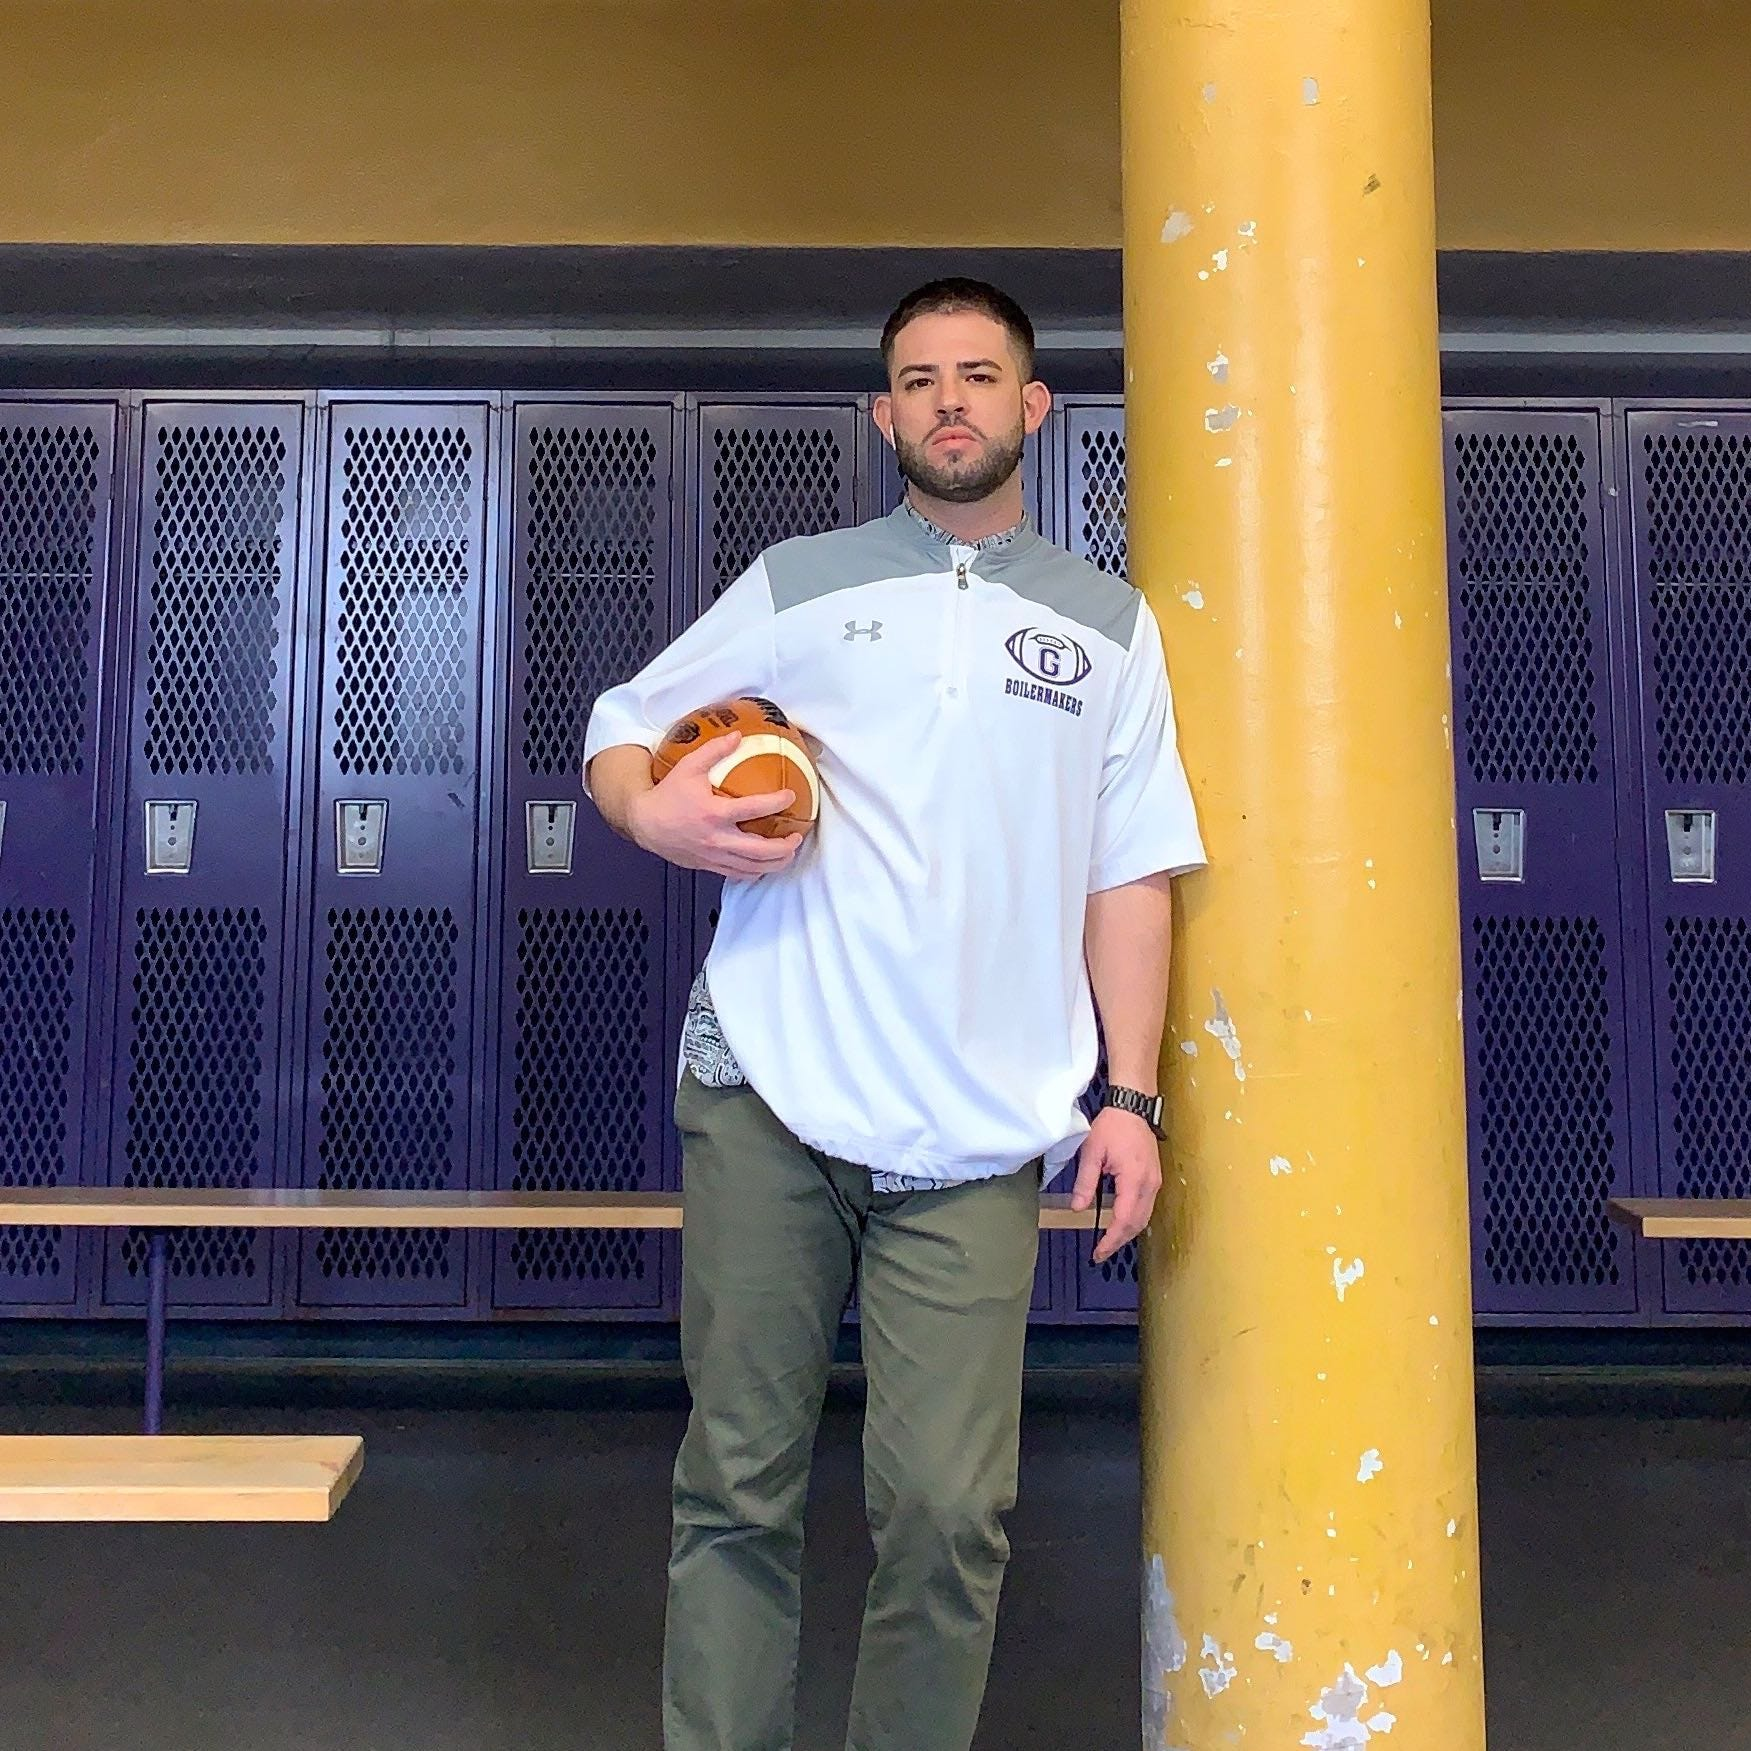 Pete Santacroce tabbed as new Garfield football coach